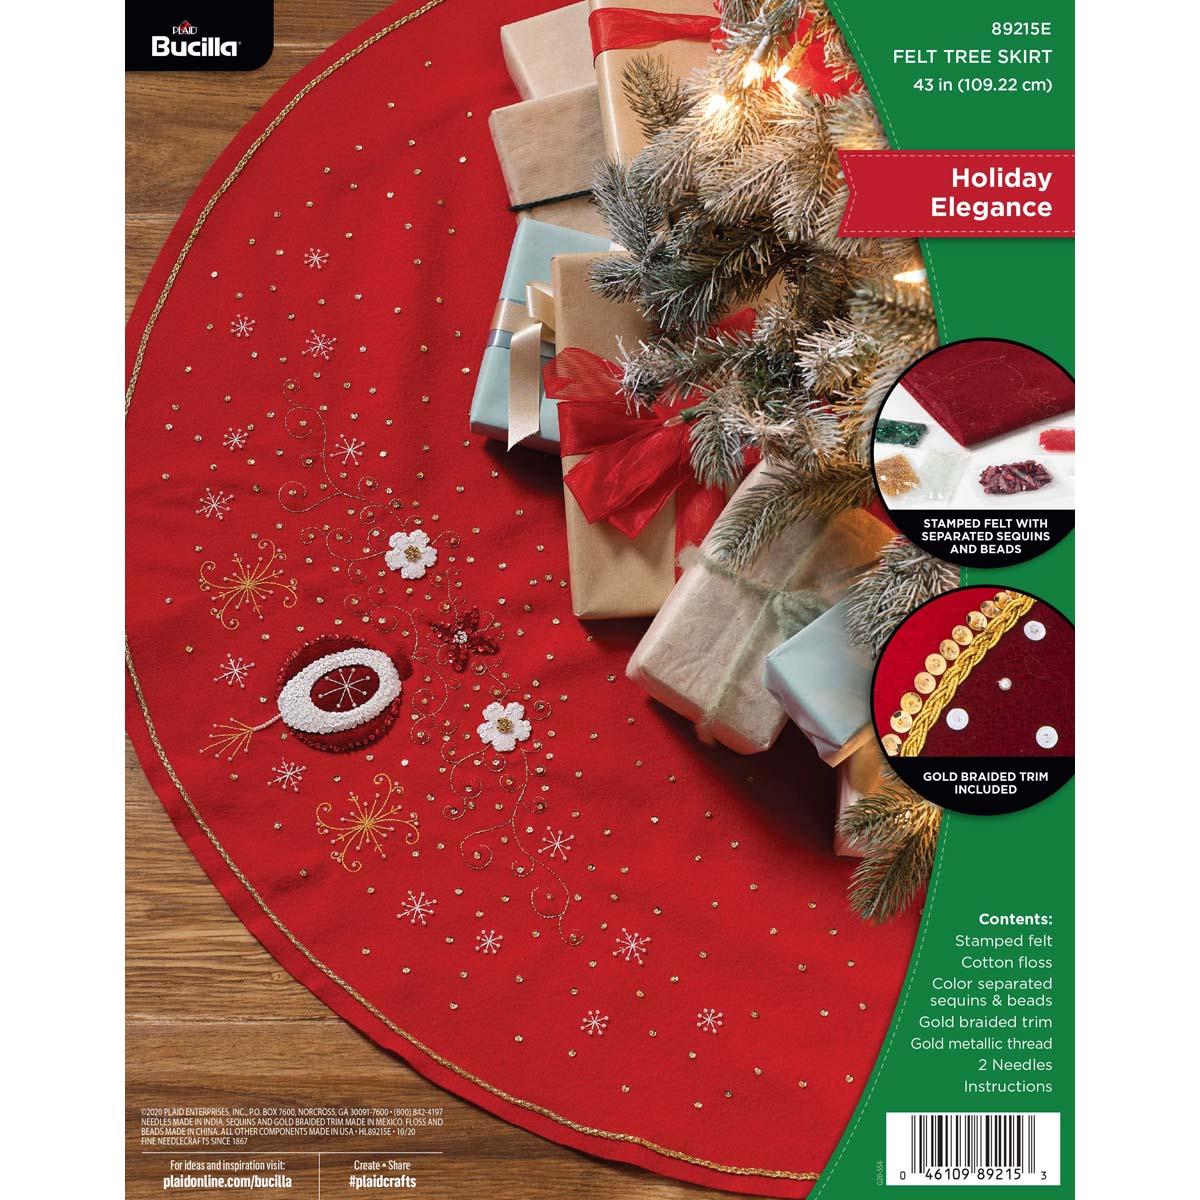 Bucilla ® Seasonal - Felt - Tree Skirt Kits - Holiday Elegance - 89215E